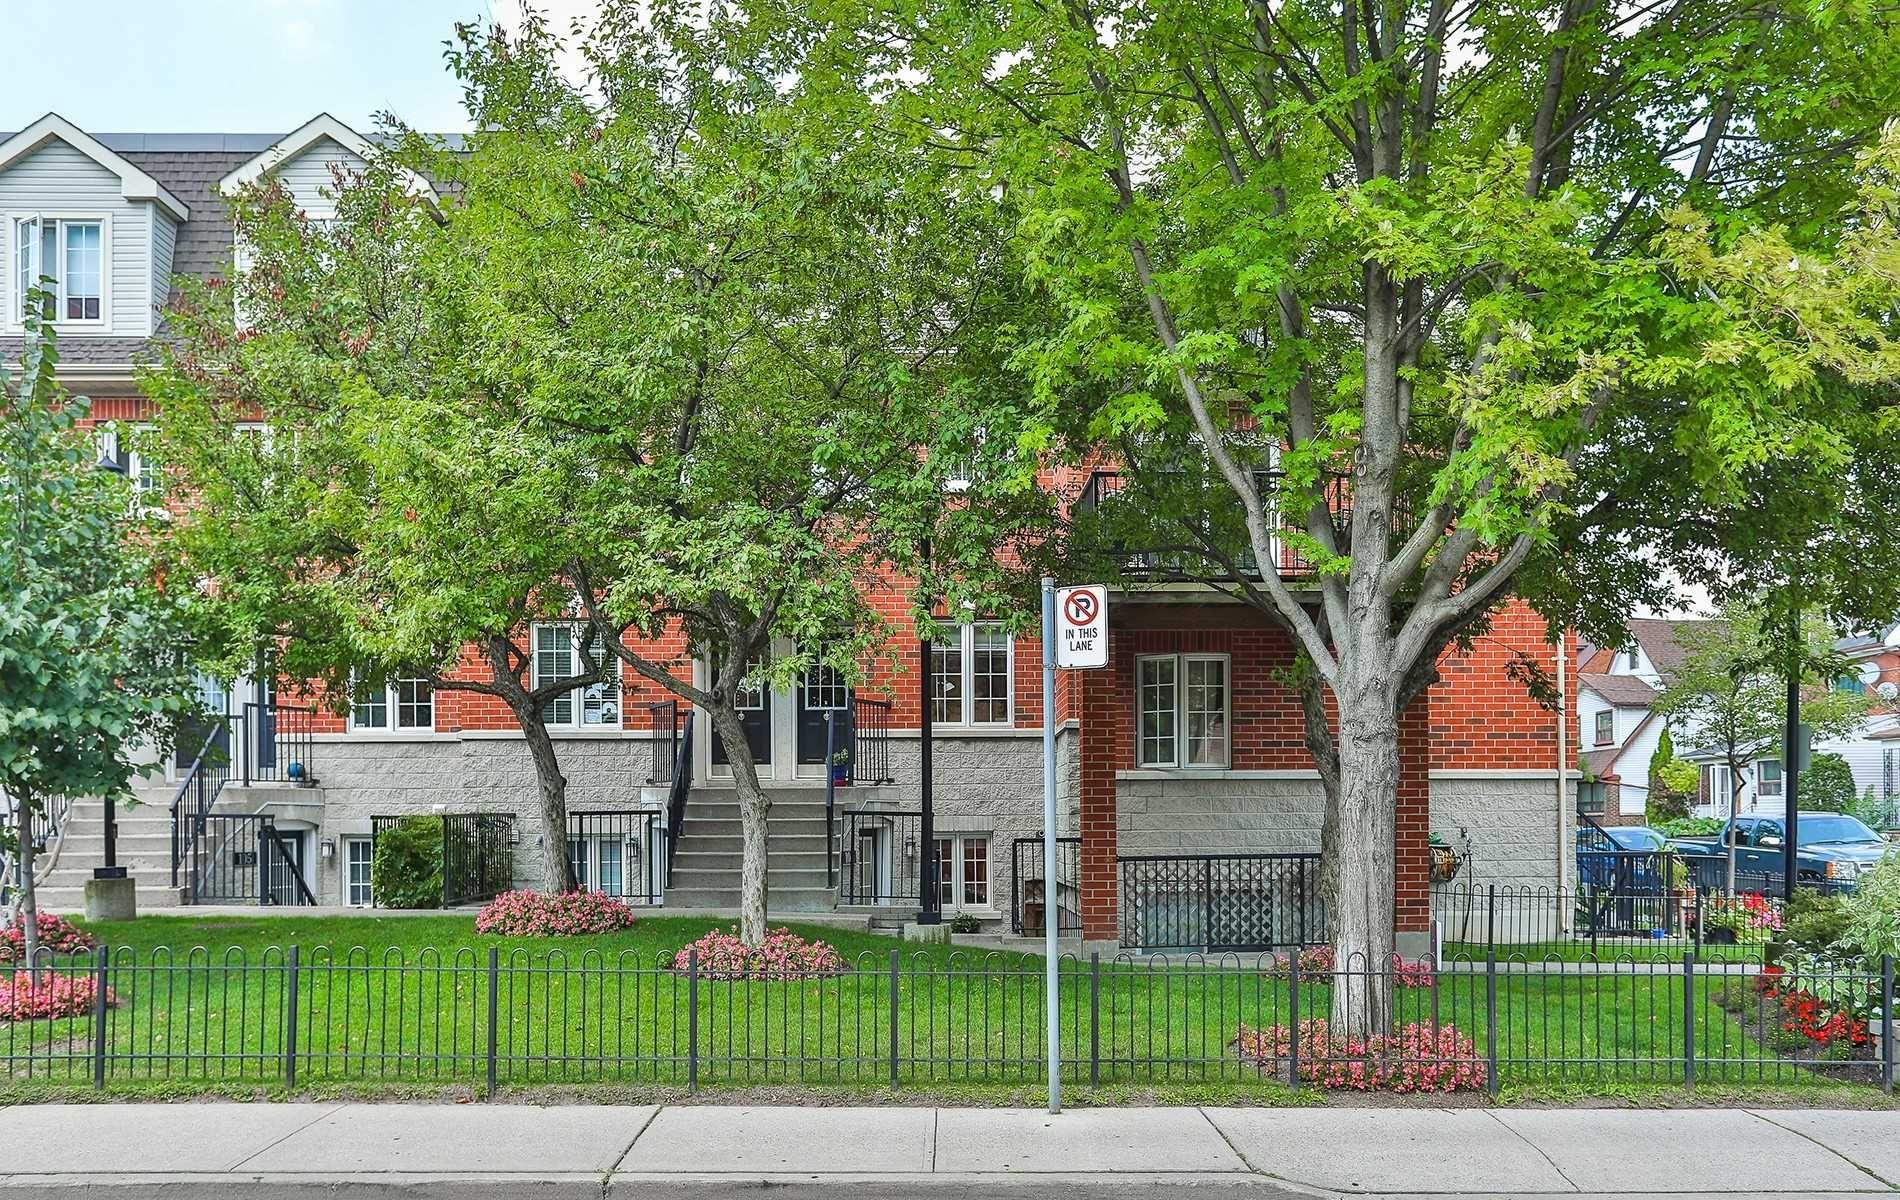 Main Photo: 103 262 St Helens Avenue in Toronto: Dufferin Grove Condo for sale (Toronto C01)  : MLS®# C4885799